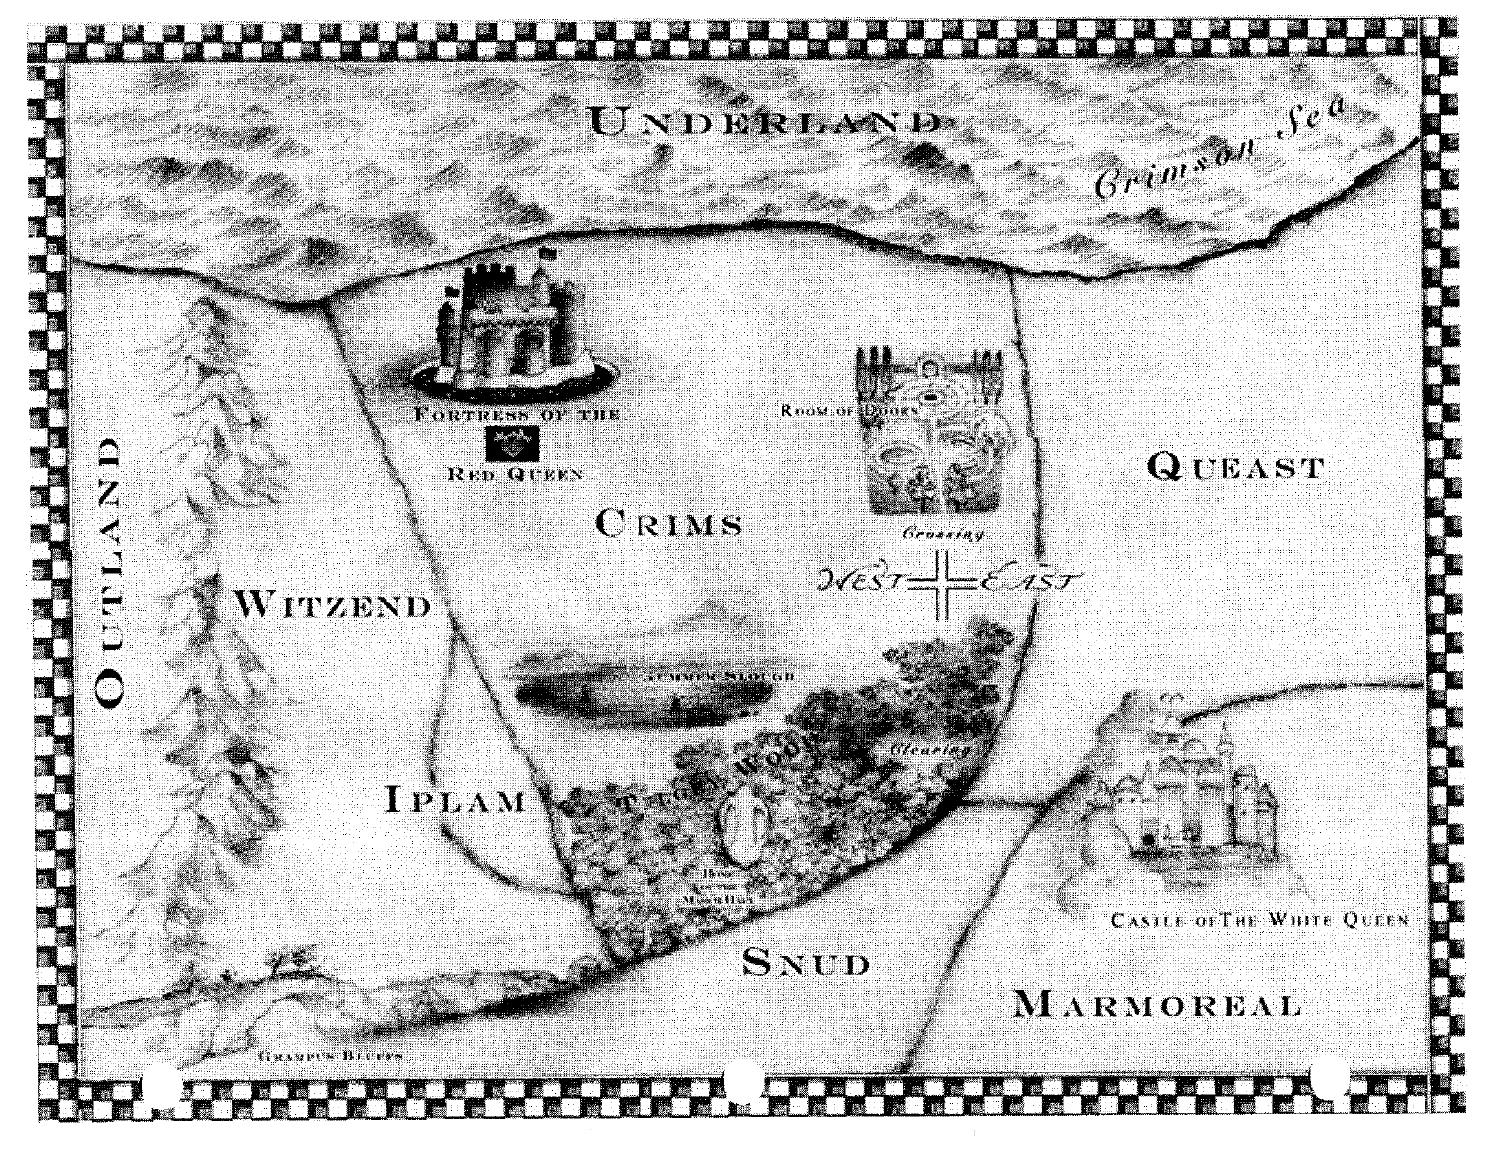 Map of Underland